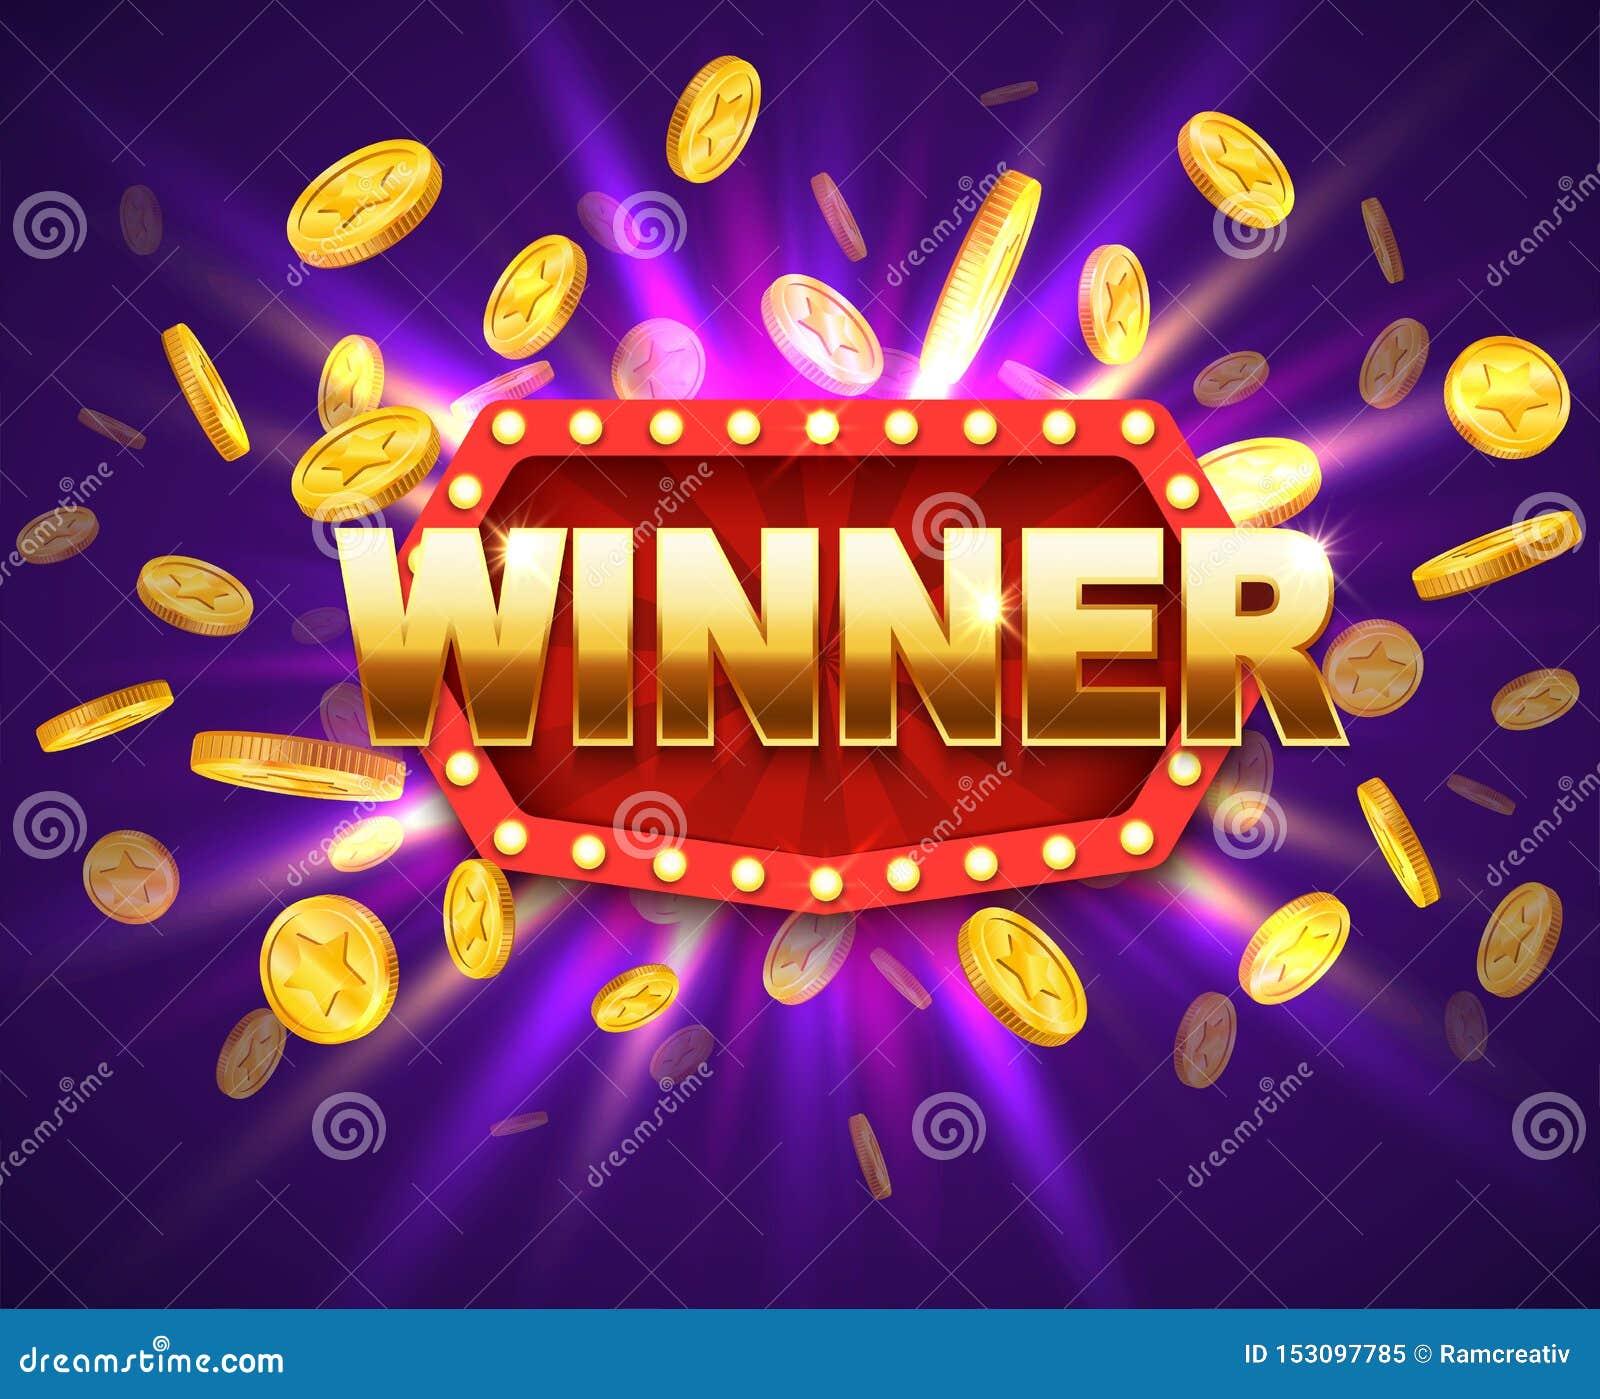 Winning Numbers - Louisiana Lottery